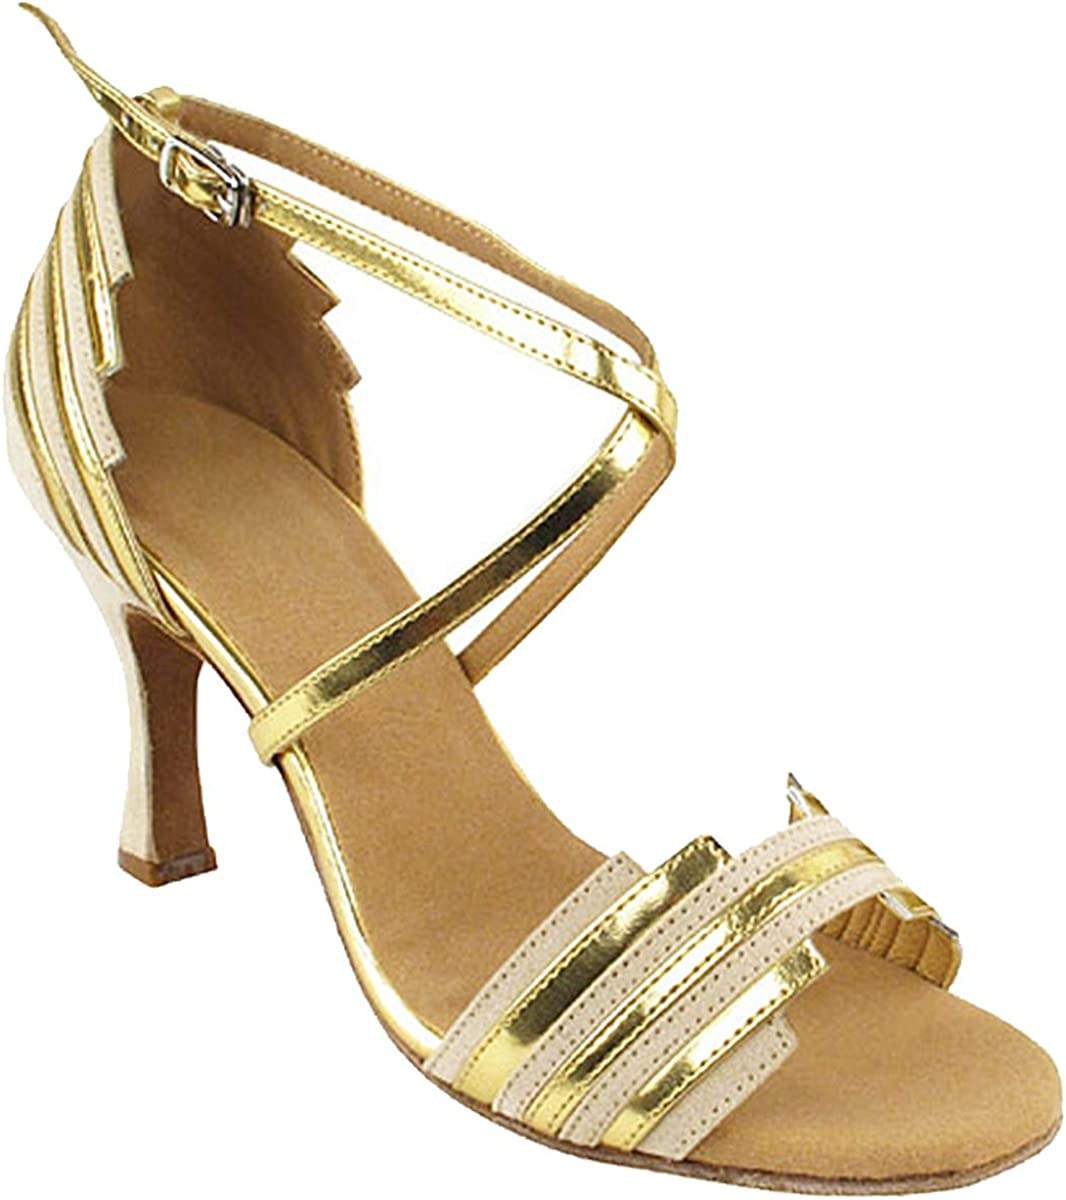 Women's Ballroom Dance Shoes Tango Wedding Salsa Dance Shoes Beige Nubuck 9691EB Comfortable - Very Fine 3